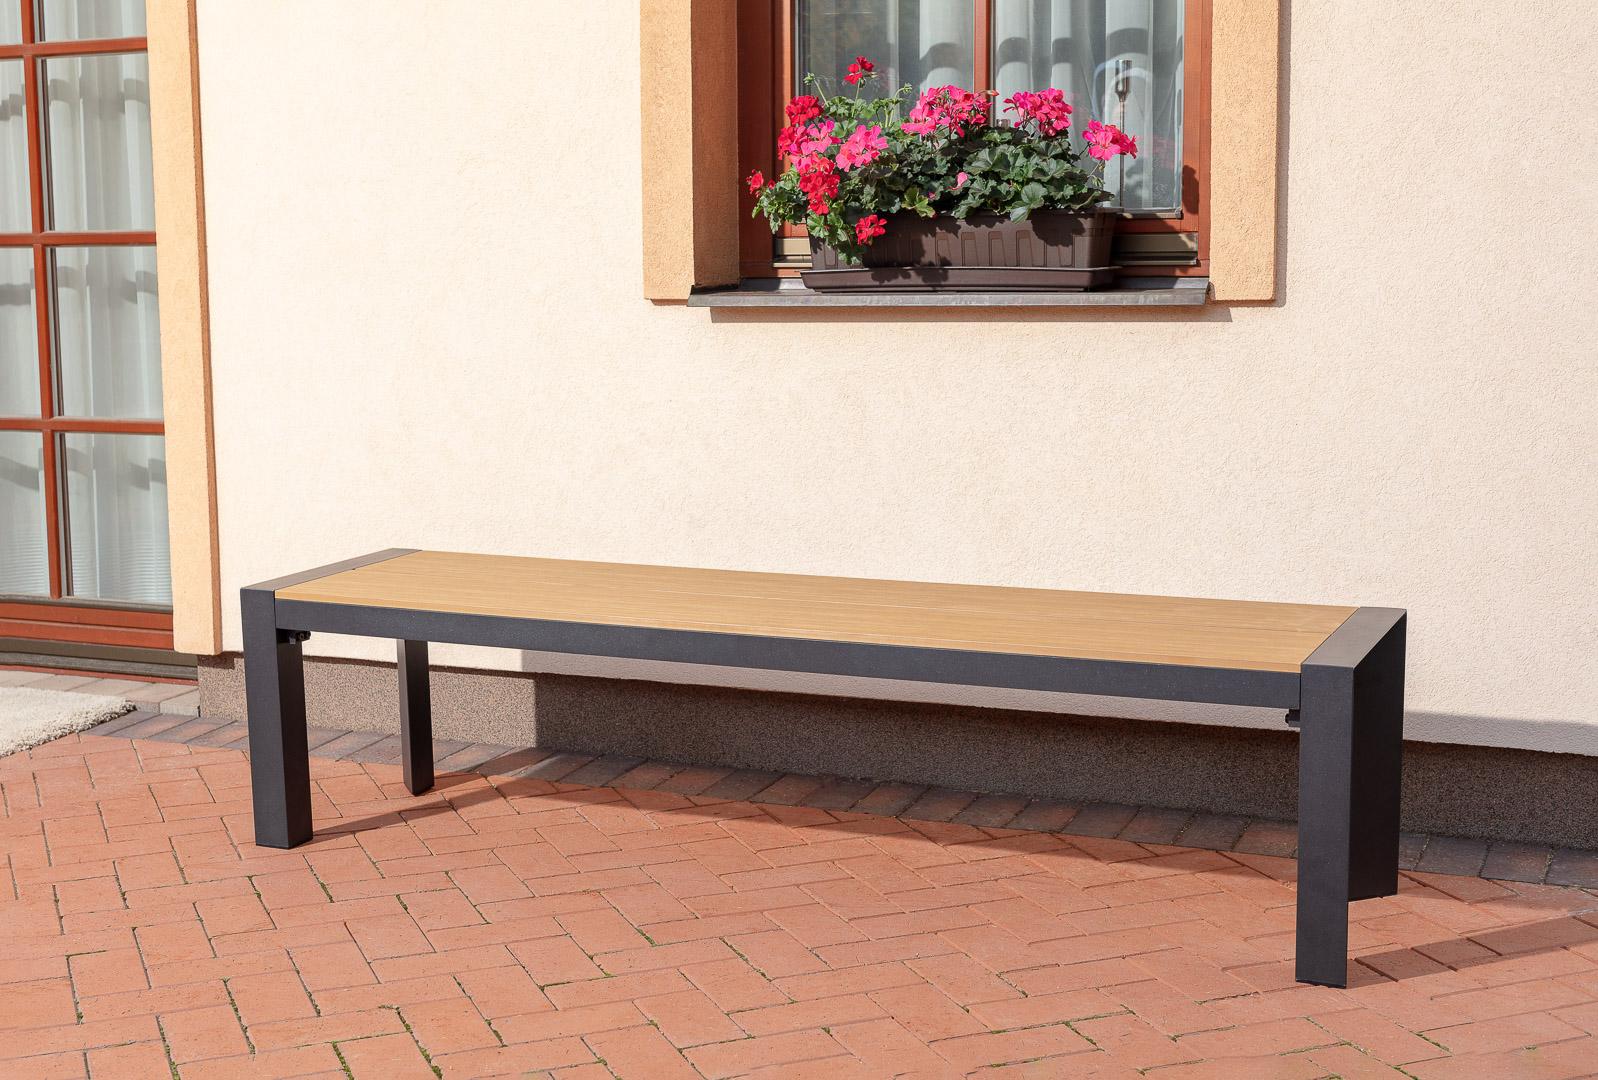 Zahradní lavice VERONA 180, cena za ks